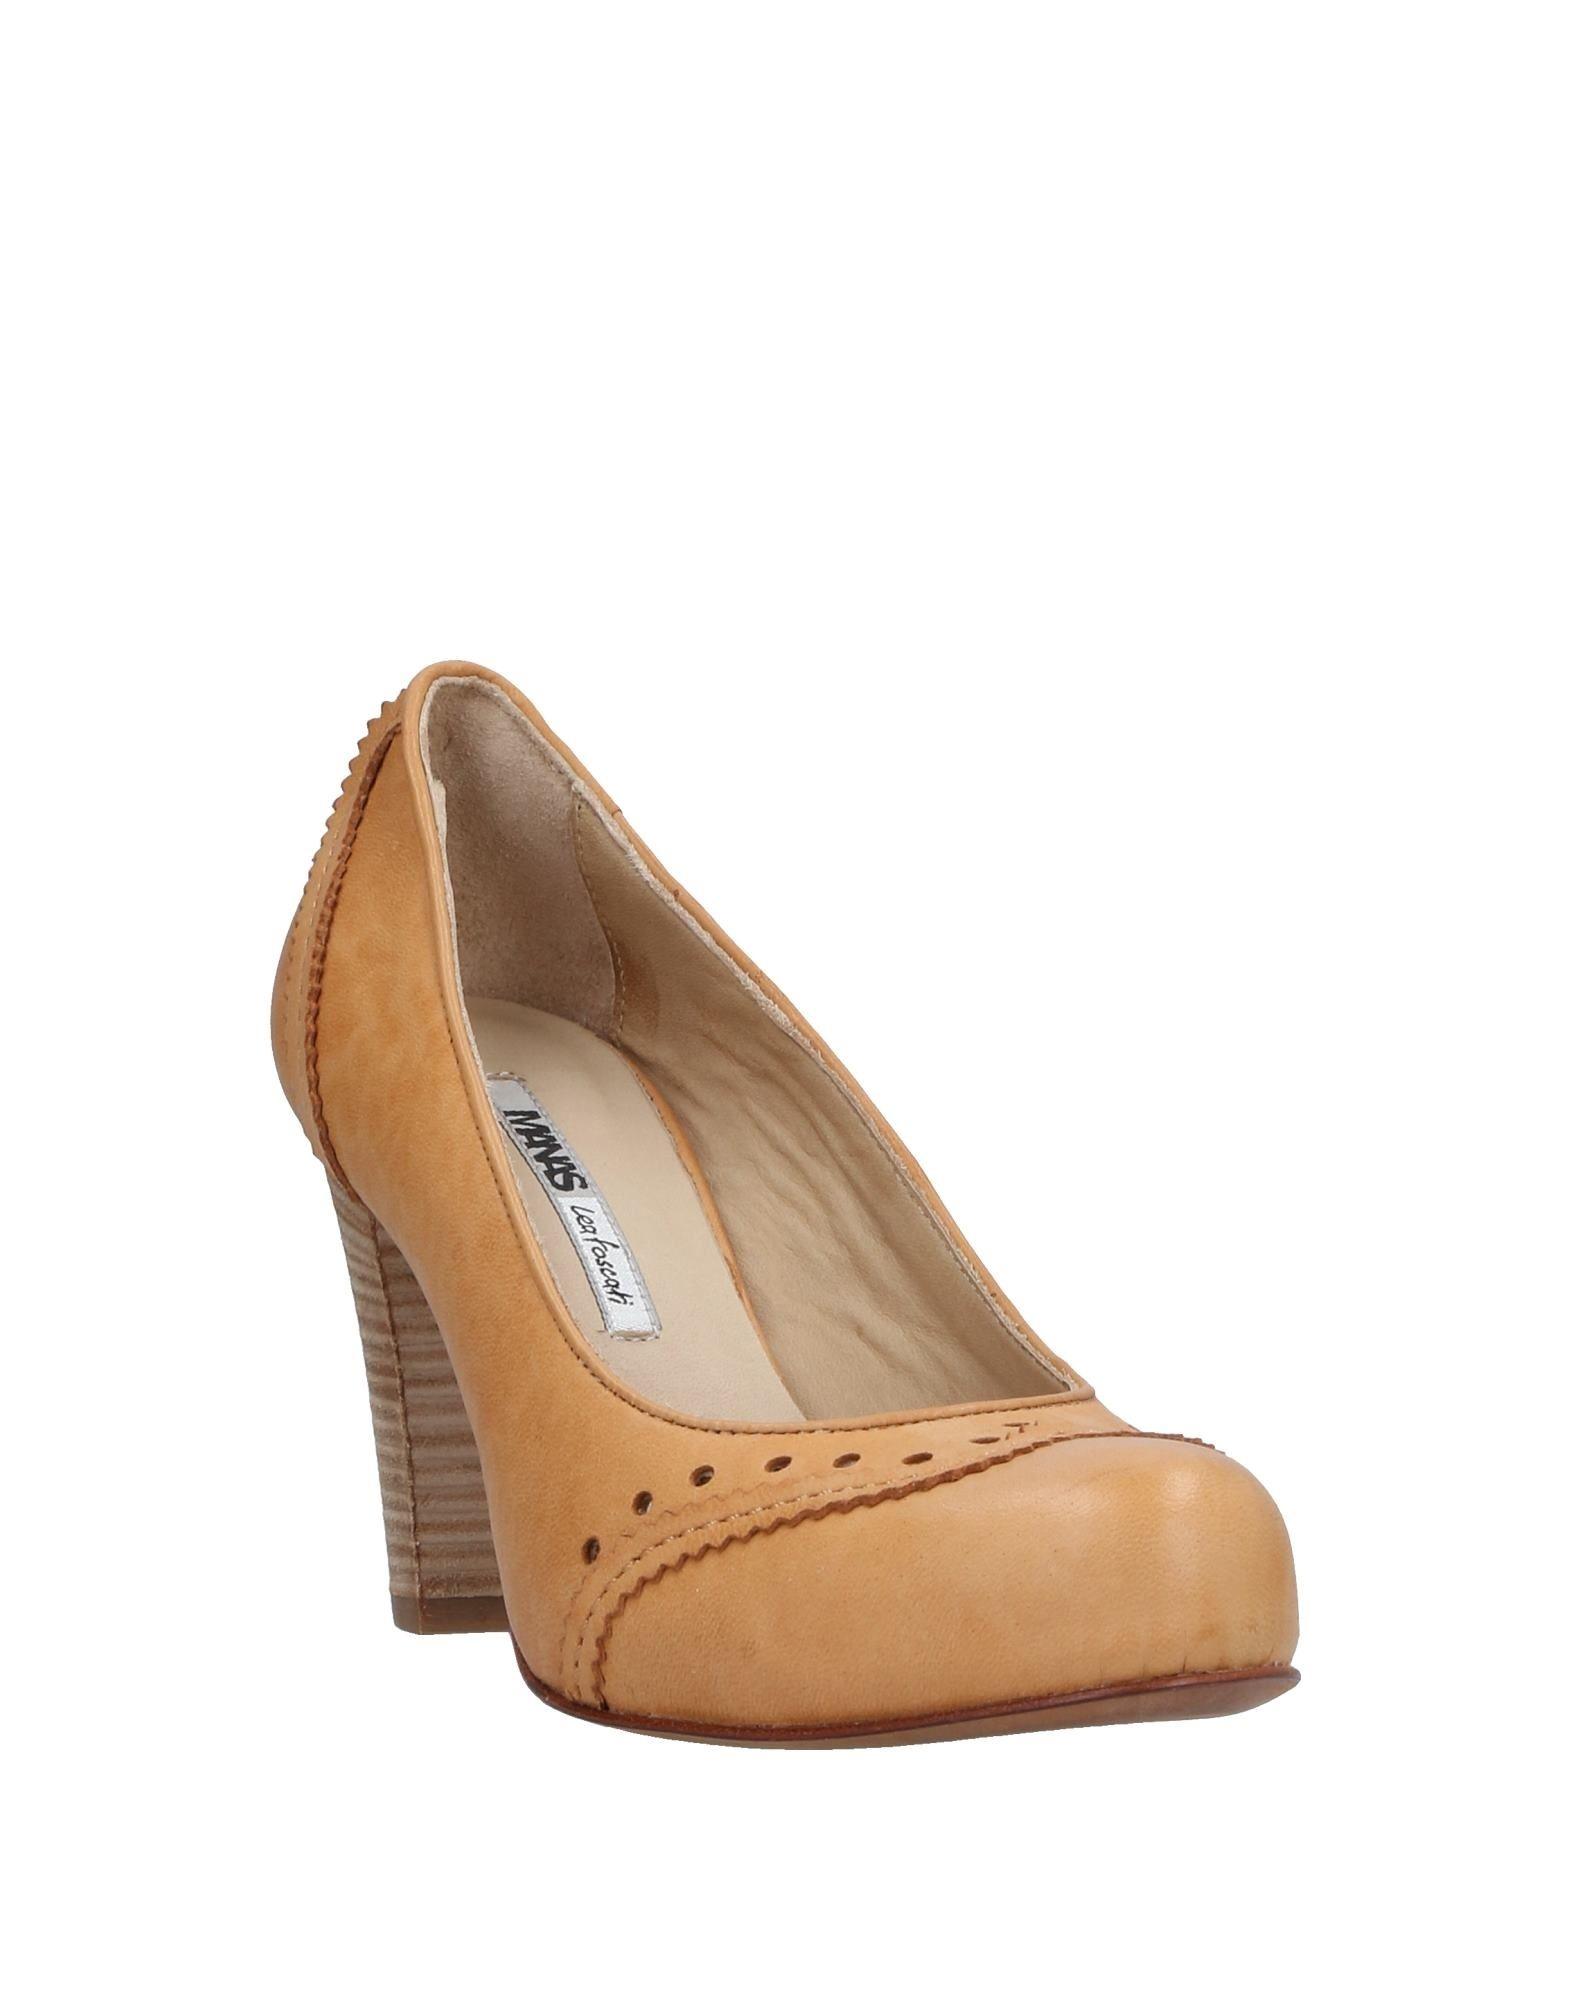 Manas Lea Foscati Pumps Damen Damen Damen  11531373MV Gute Qualität beliebte Schuhe ef11a8